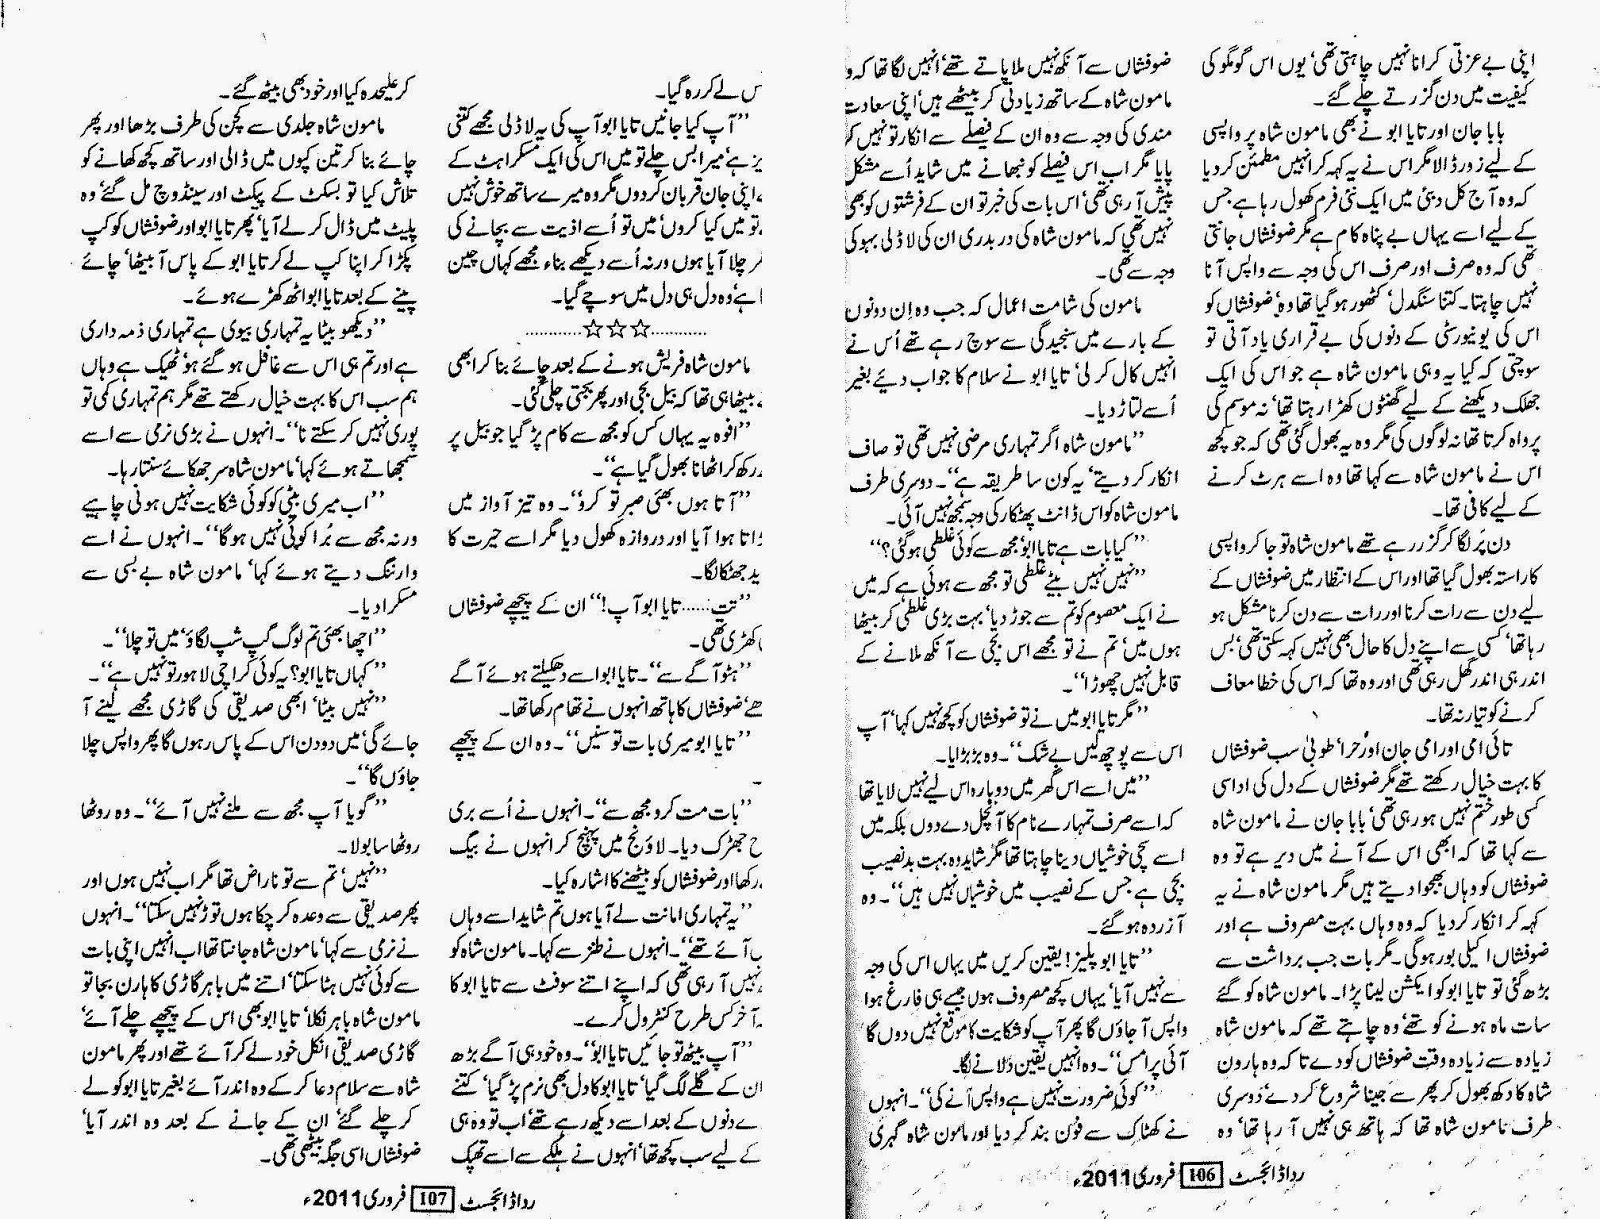 mera bahtreen dost essay in urdu Urdu essay in urdu language - no fails with our high class essay services bruno  hunted torment, 2014 kitab behtreen dost essay in urdu stories.